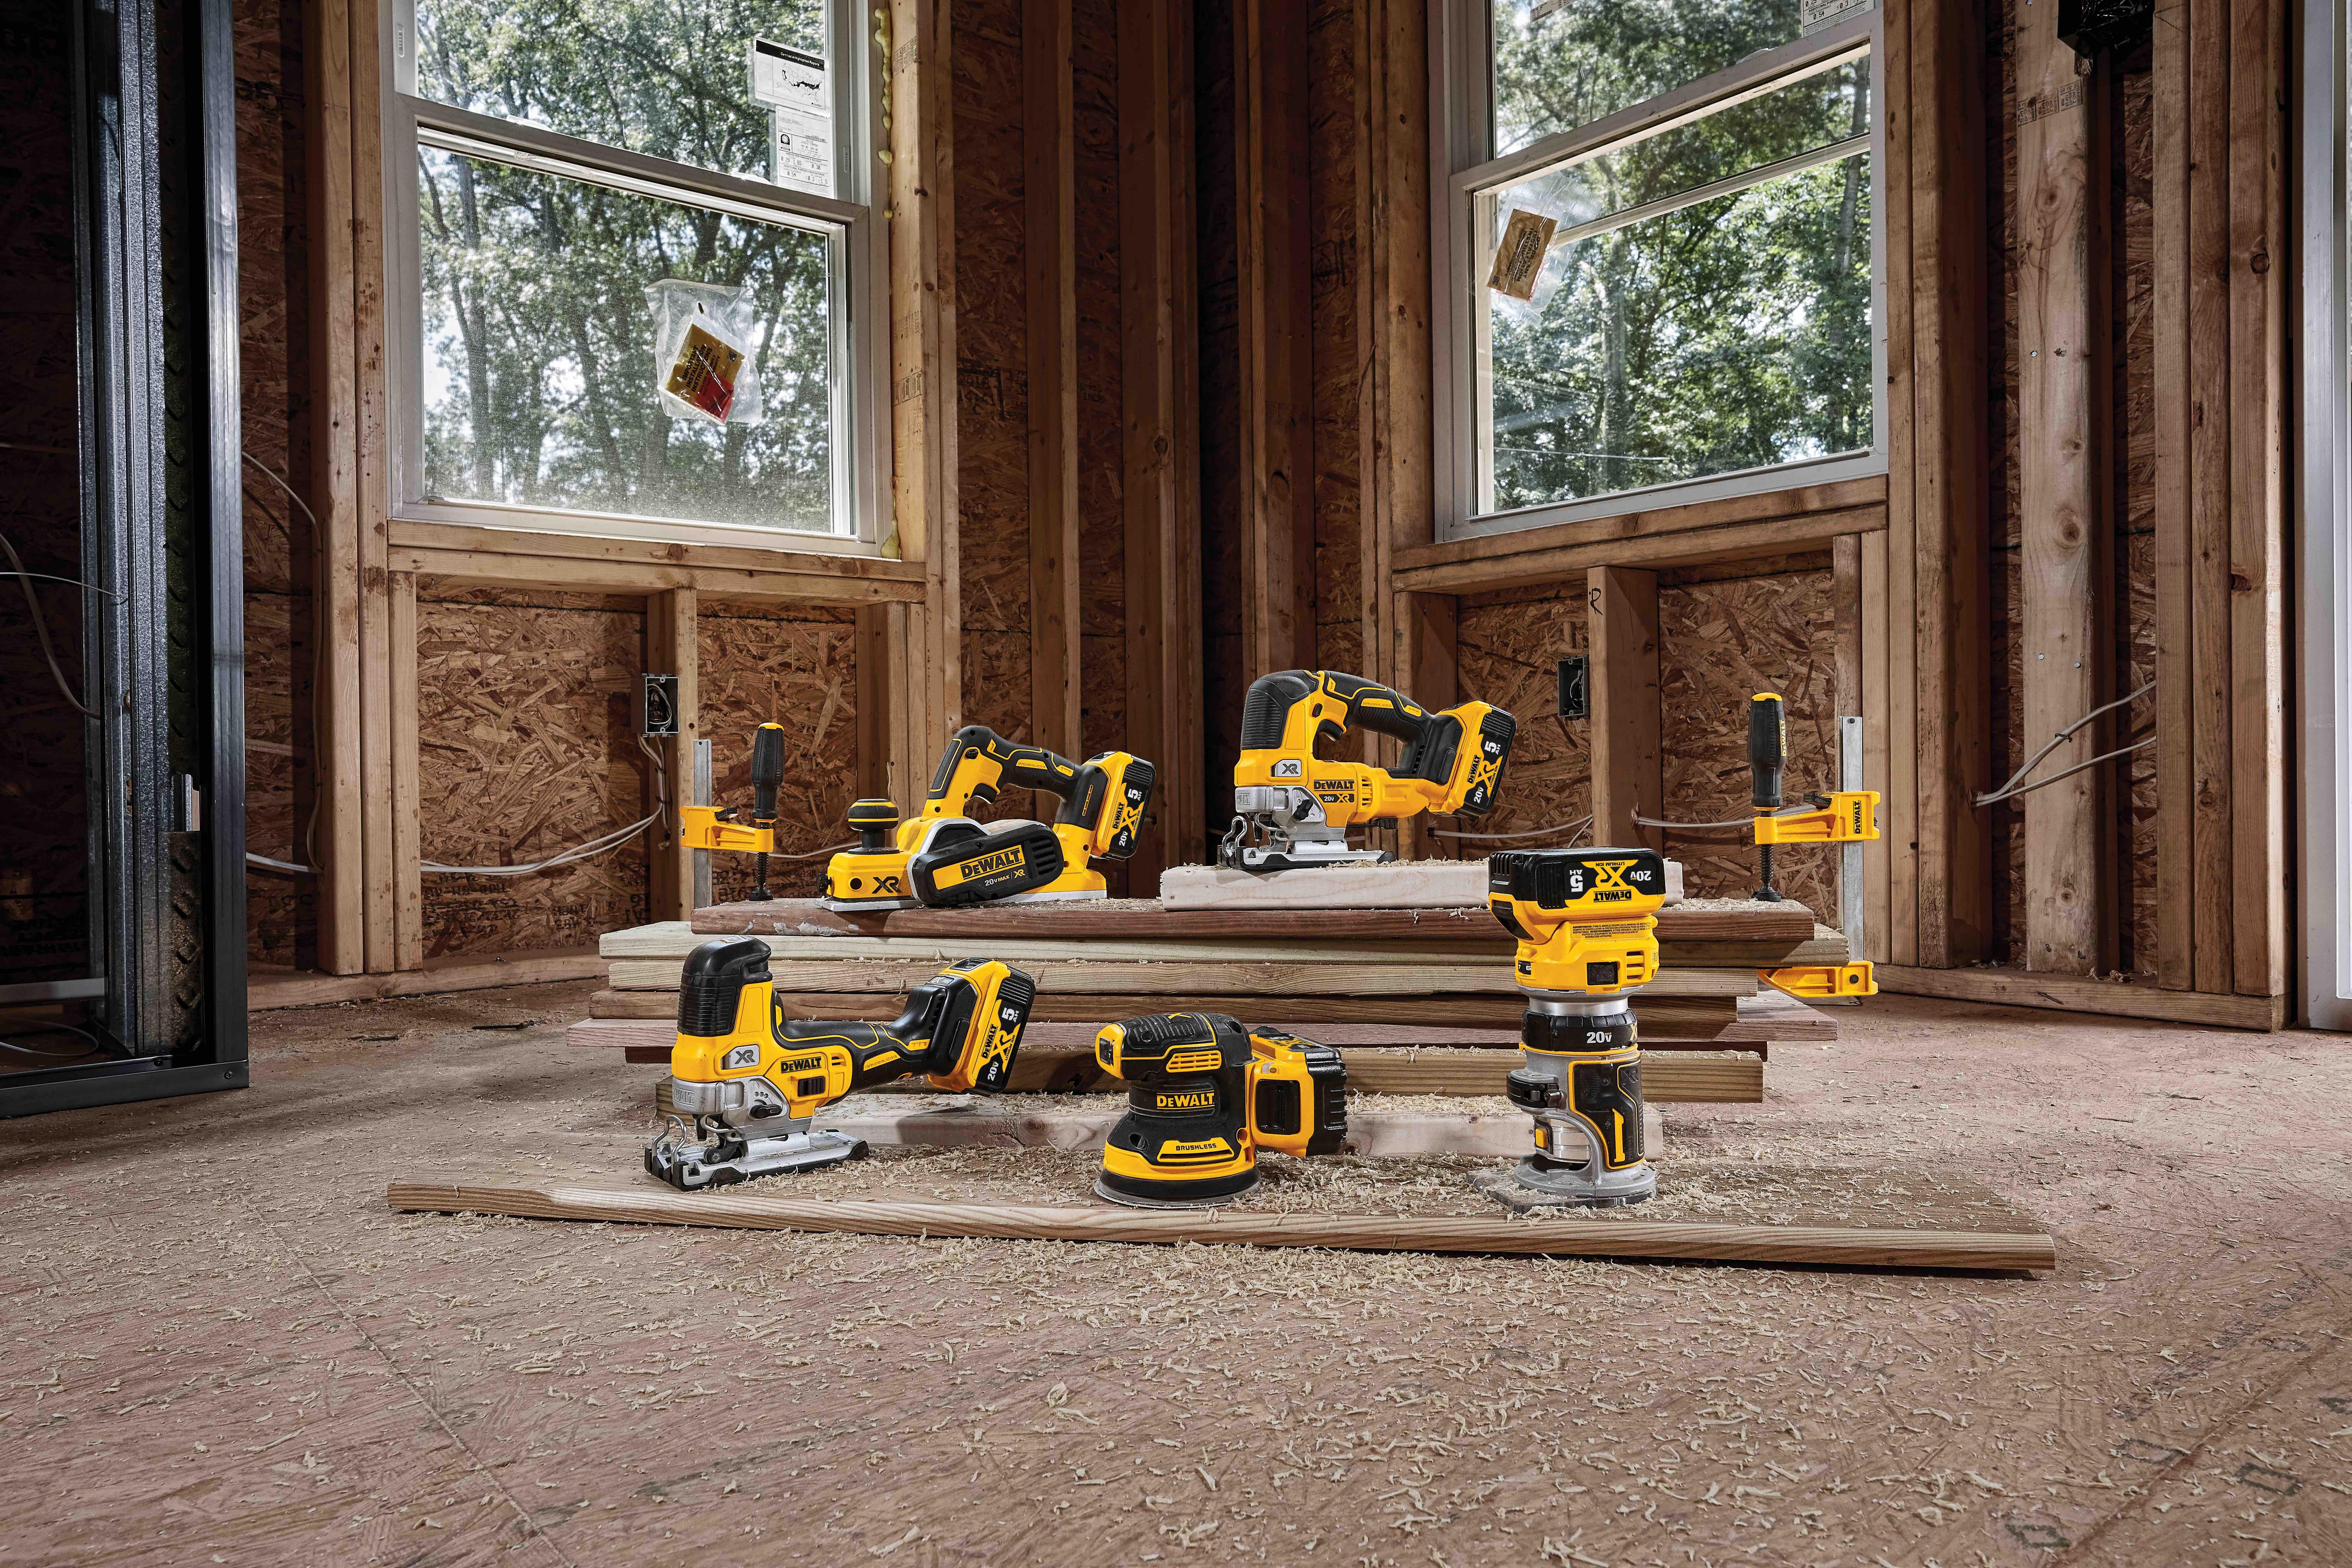 New DeWALT Brushless Cordless Woodworking Tools